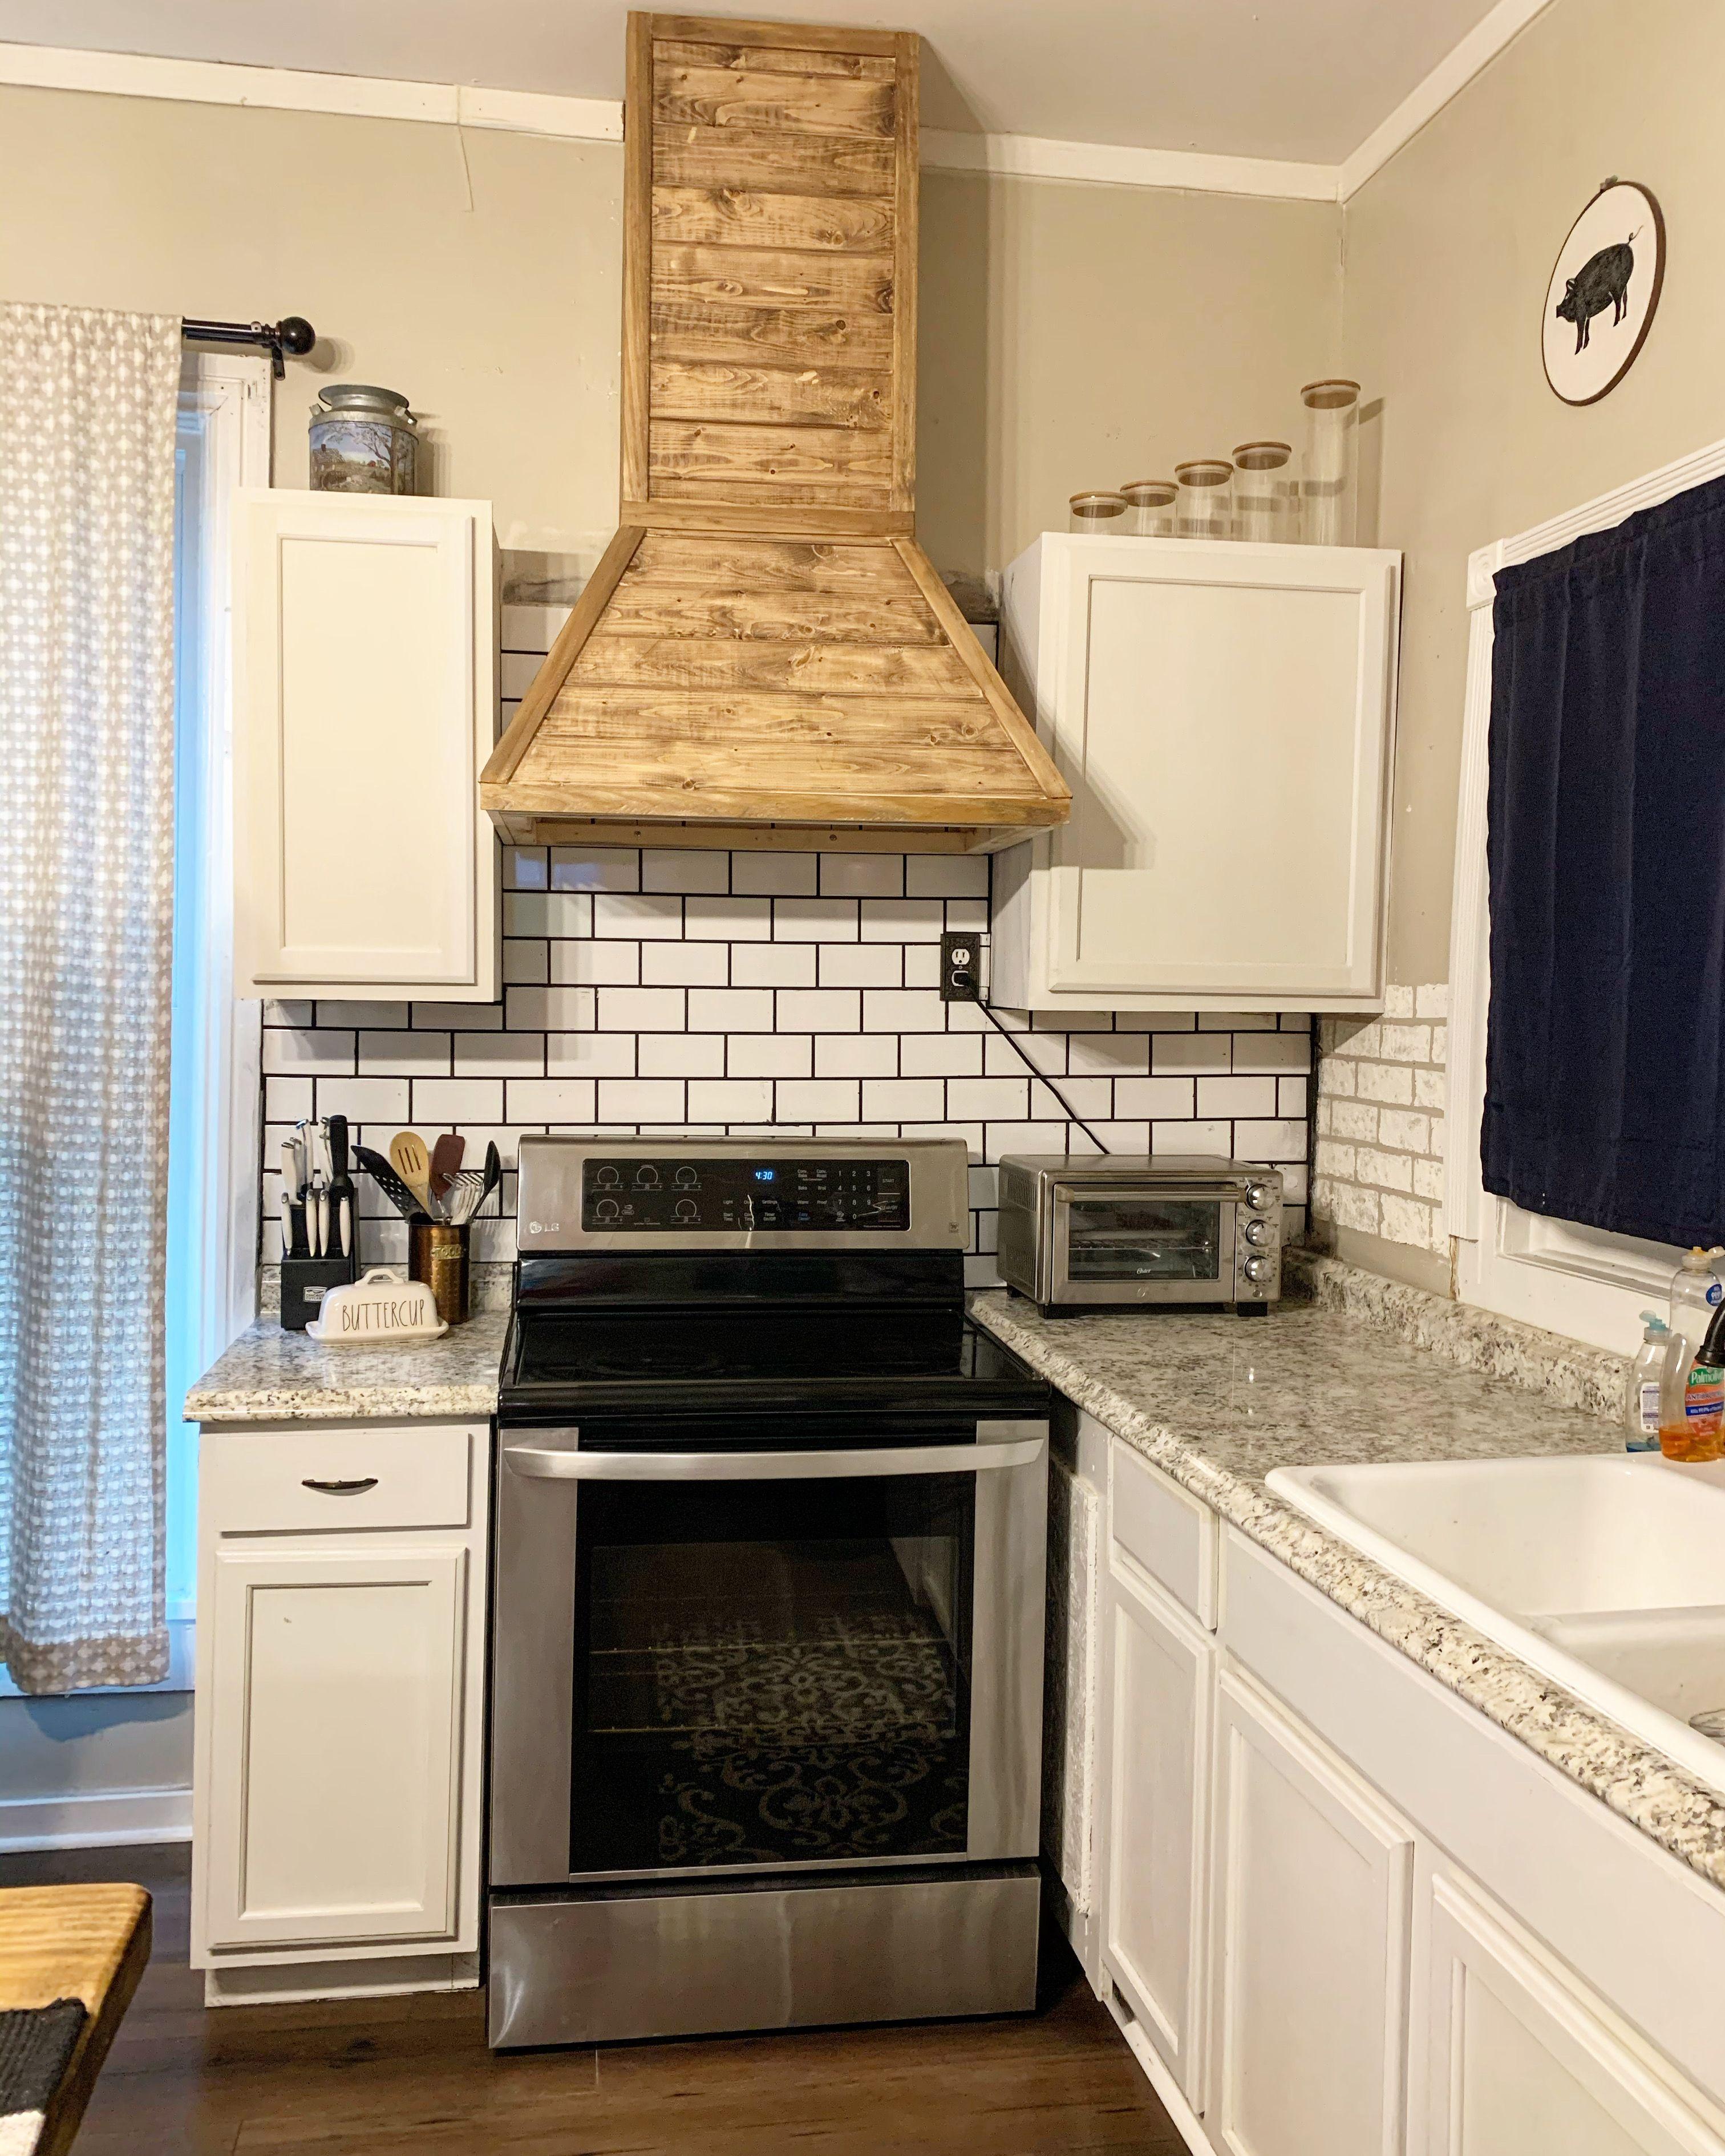 #diy #hoodvent #subwaytile in 2020 | Subway tile kitchen ...